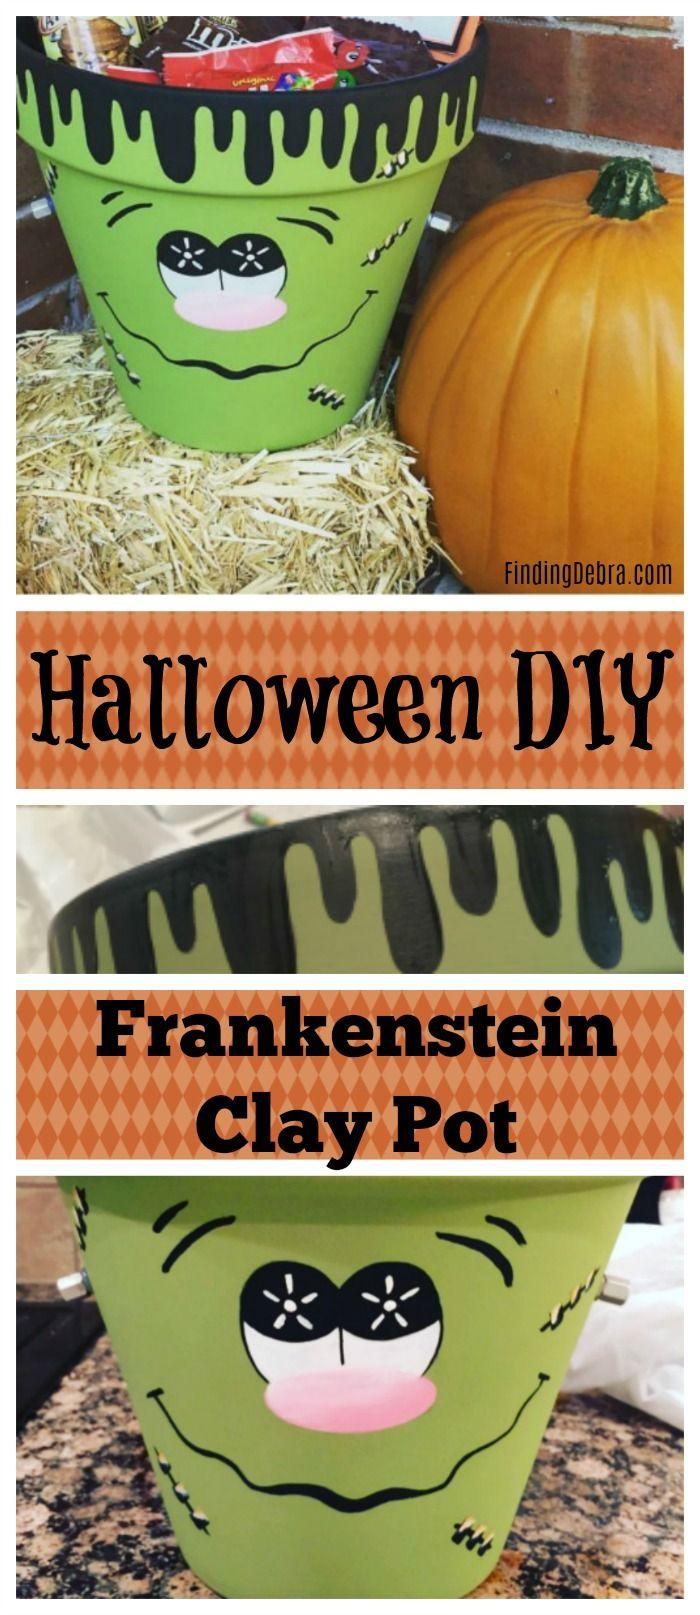 Halloween DIY Frankenstein Clay Pot For Treats, Booing your neighbor - cute homemade halloween decorations